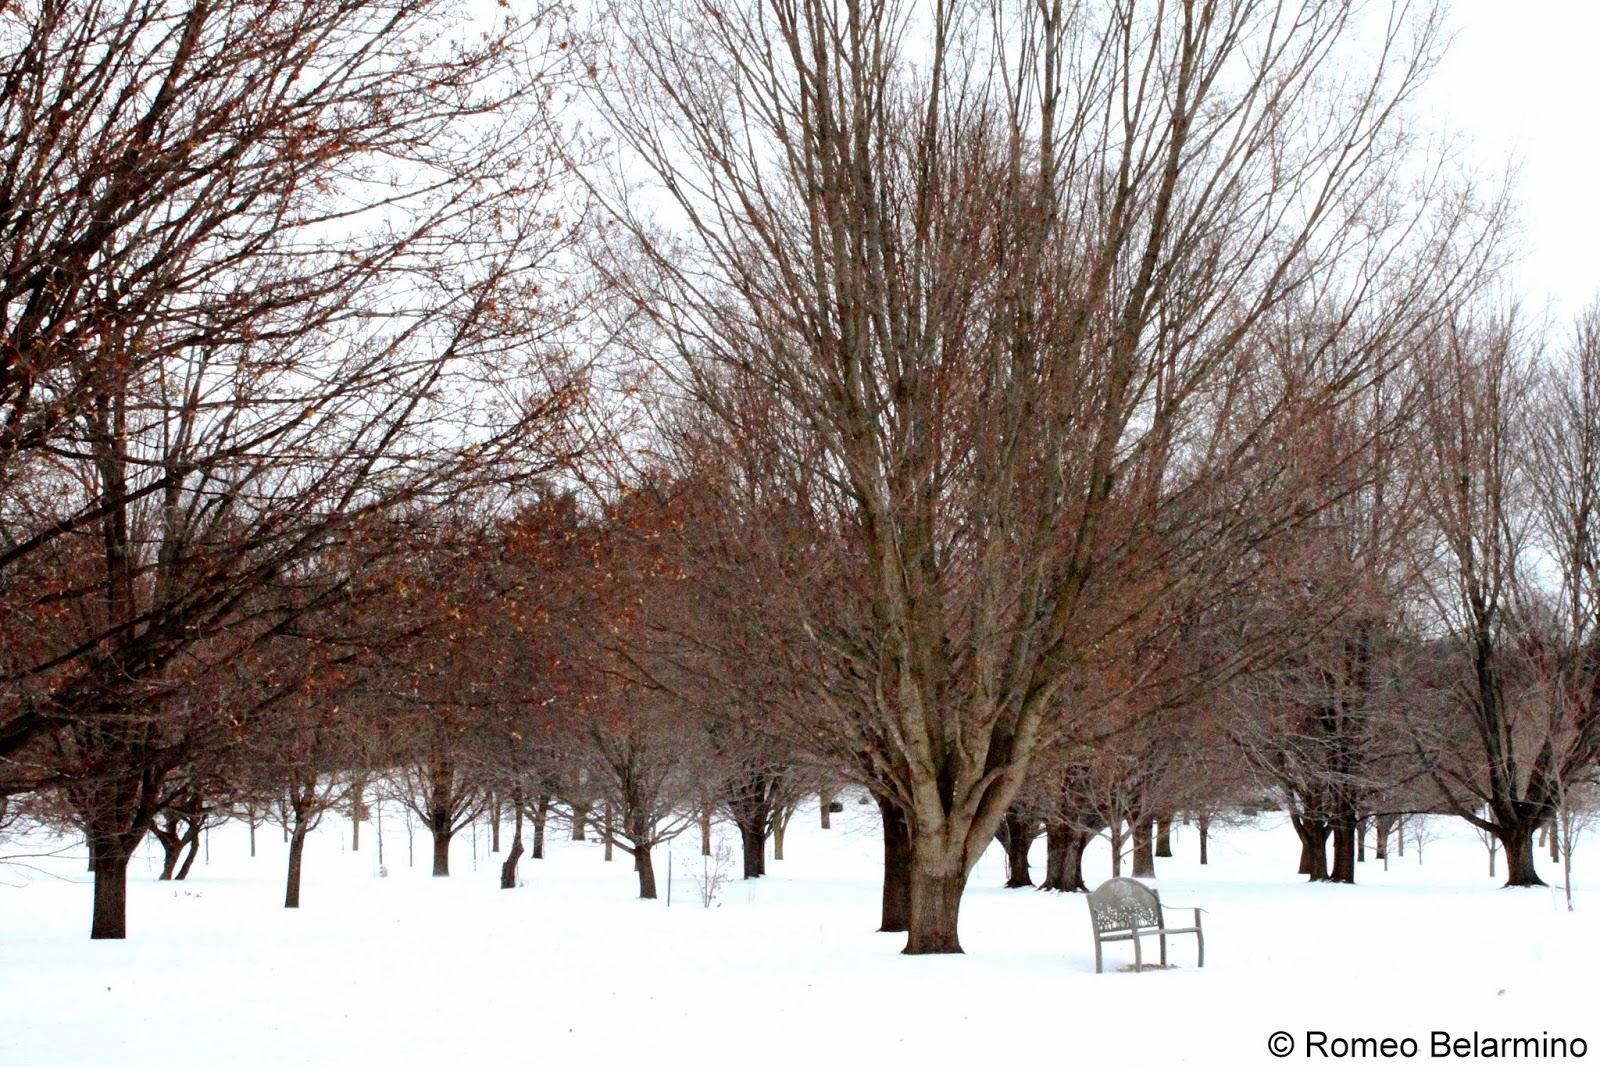 Longenecker Horticultural Gardens University of Wisconsin-Madison Arboretum